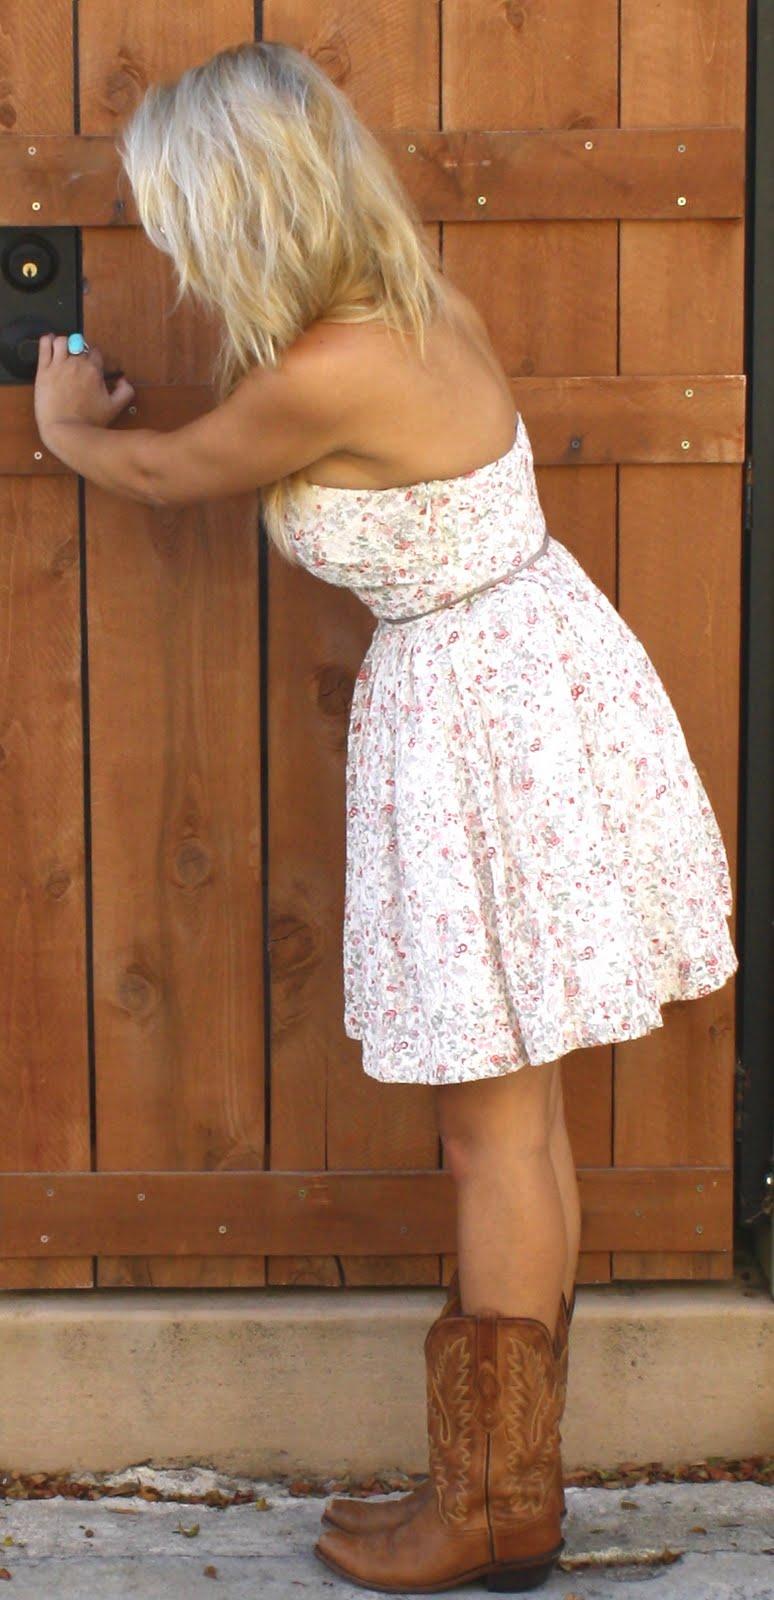 White Short Wedding Dresses With Cowboy Boots | Fashion Ideas